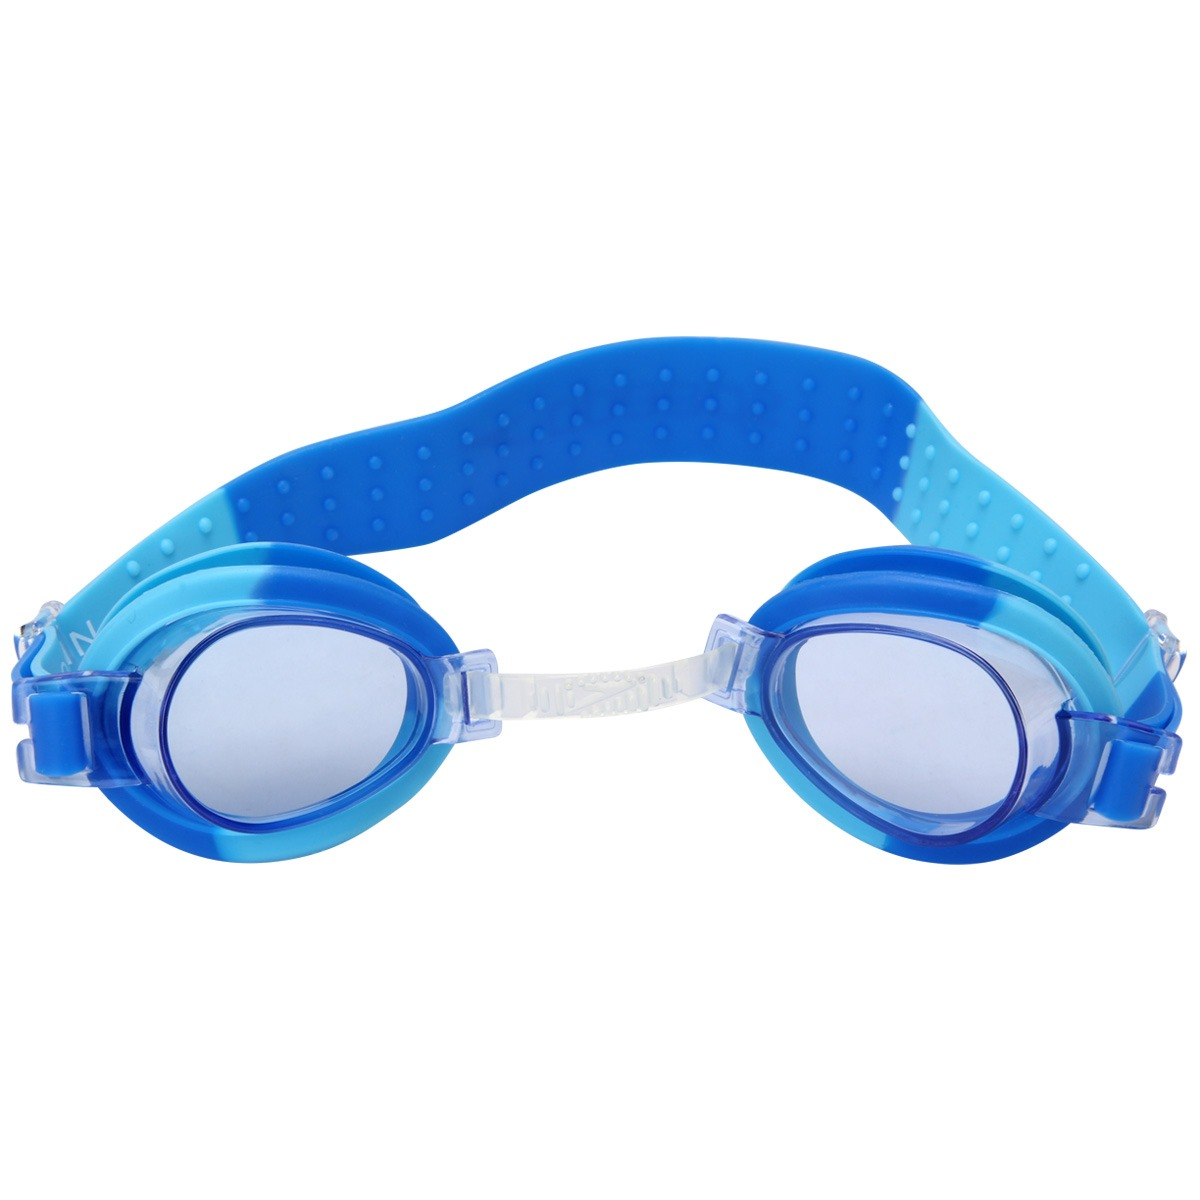 kit infantil óculos + touca fish combo azul - speedo. Carregando zoom. 8293cecd8d62b